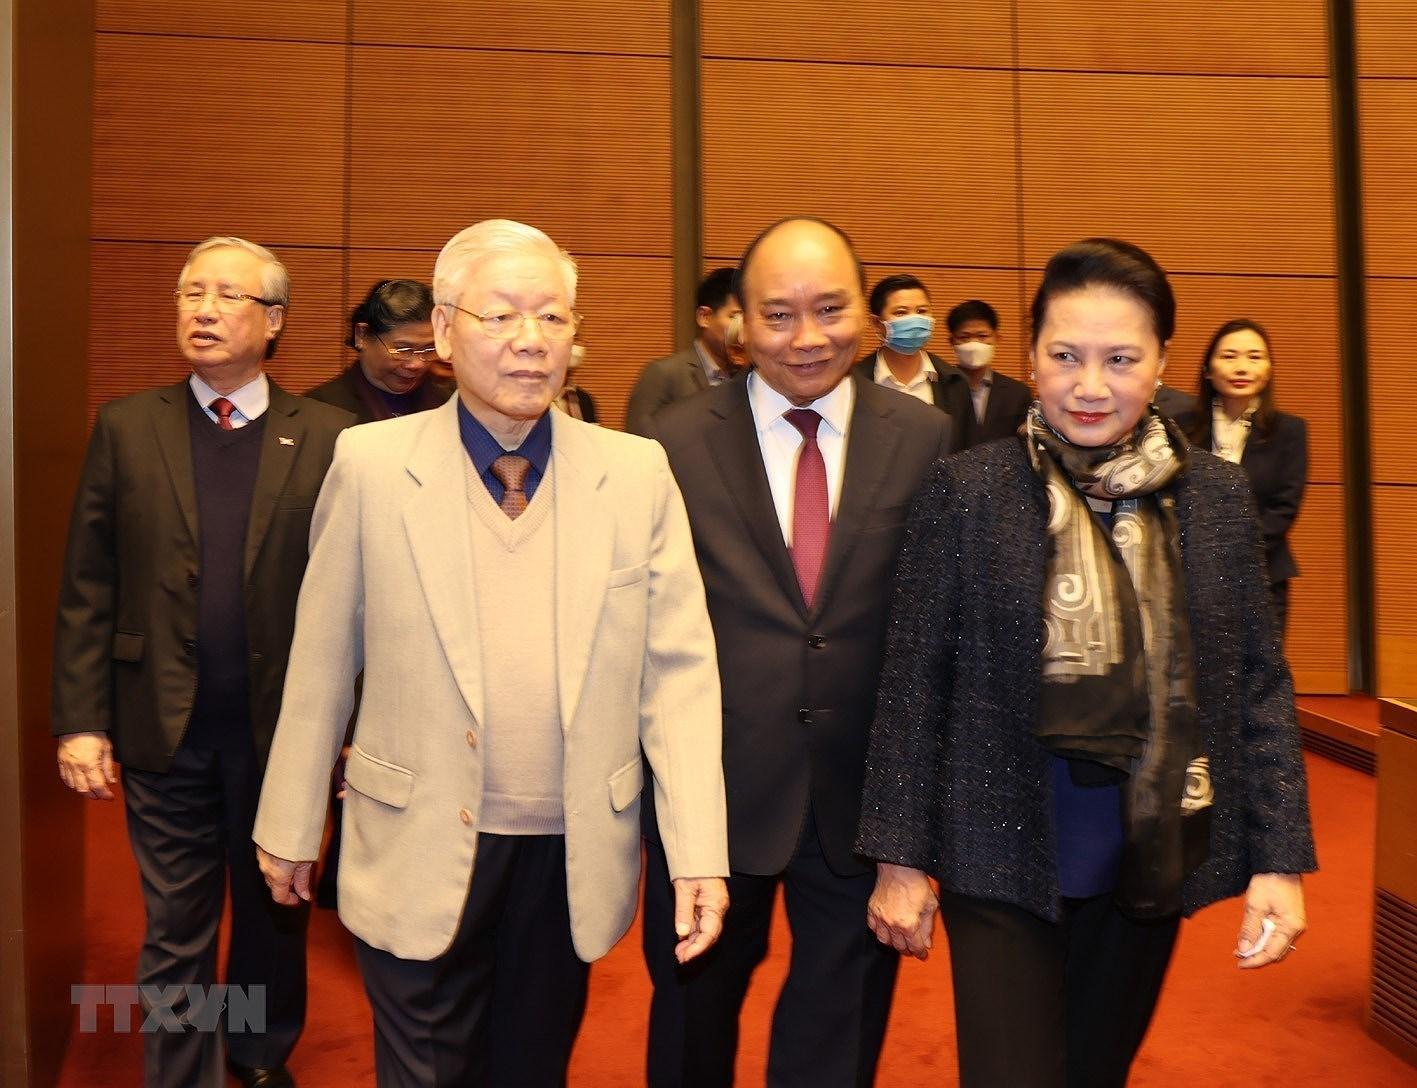 Tong Bi thu, Chu tich nuoc chi dao Hoi nghi trien khai cong tac bau cu hinh anh 4